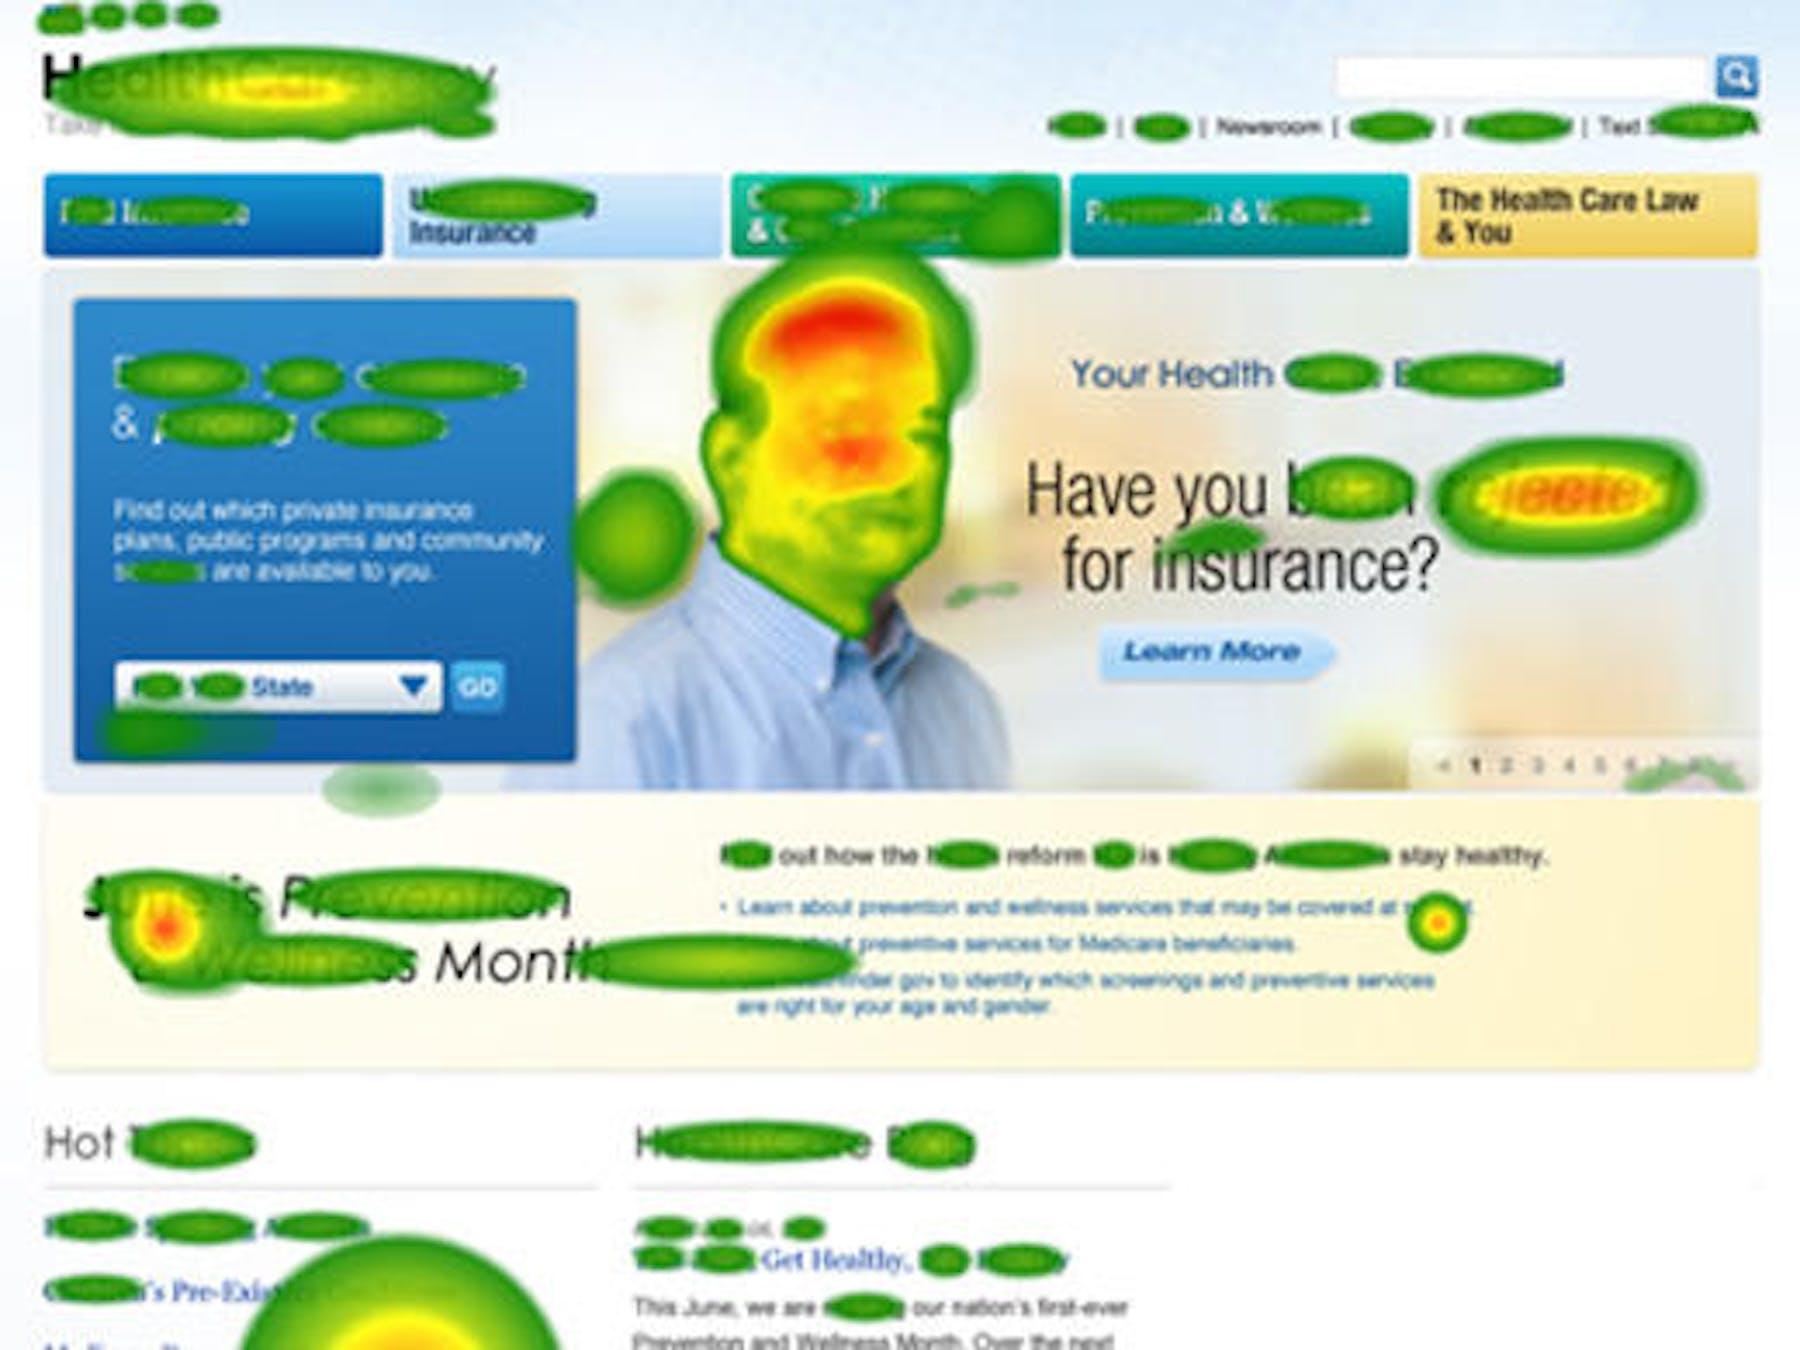 eyetracking heatmaps on a website